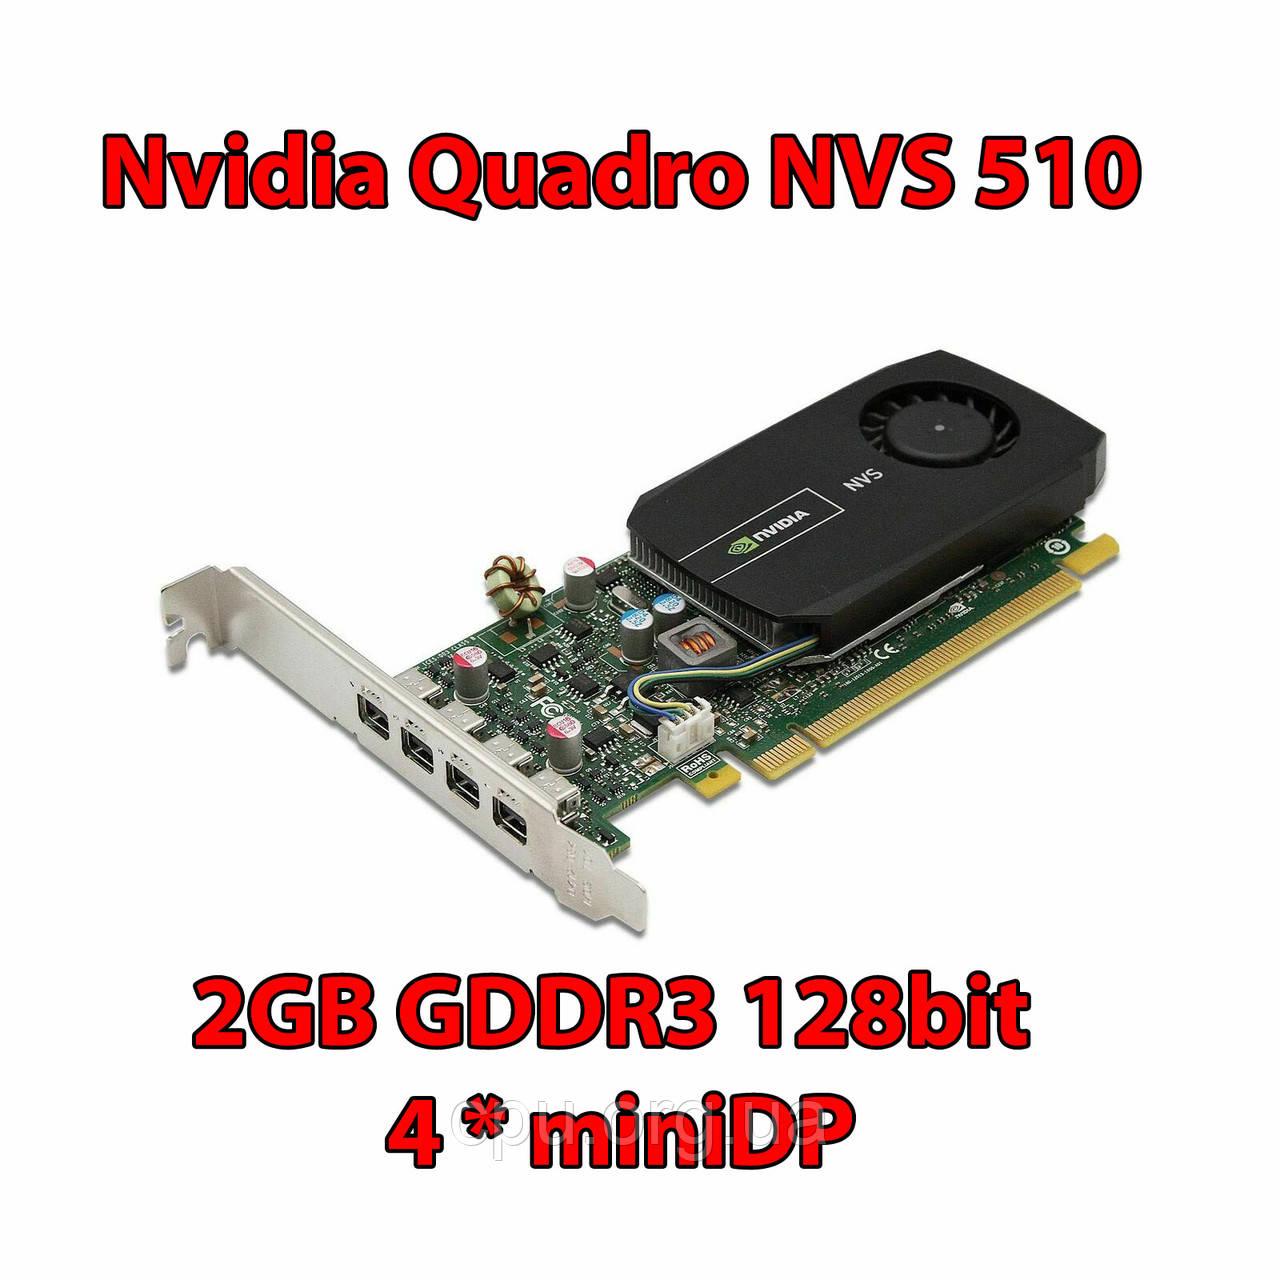 NVidia Quadro NVS 510 2048Mb GDDR3 128bit PCI-Ex (4*miniDisplayPort)